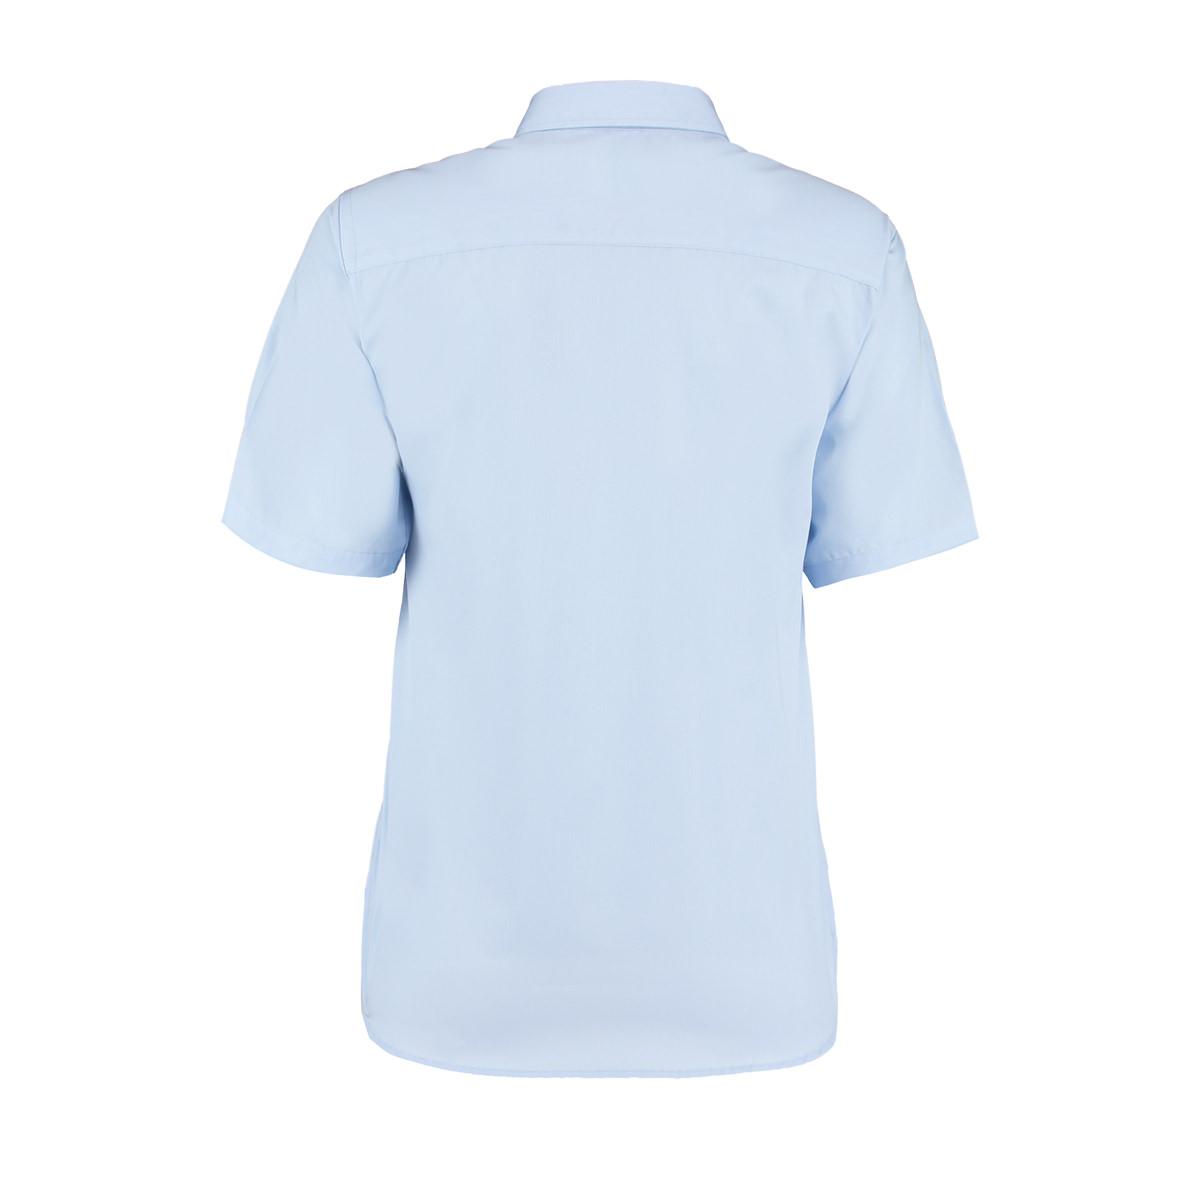 Kk315 women 39 s non iron shirt kustom kit for What is a non iron shirt